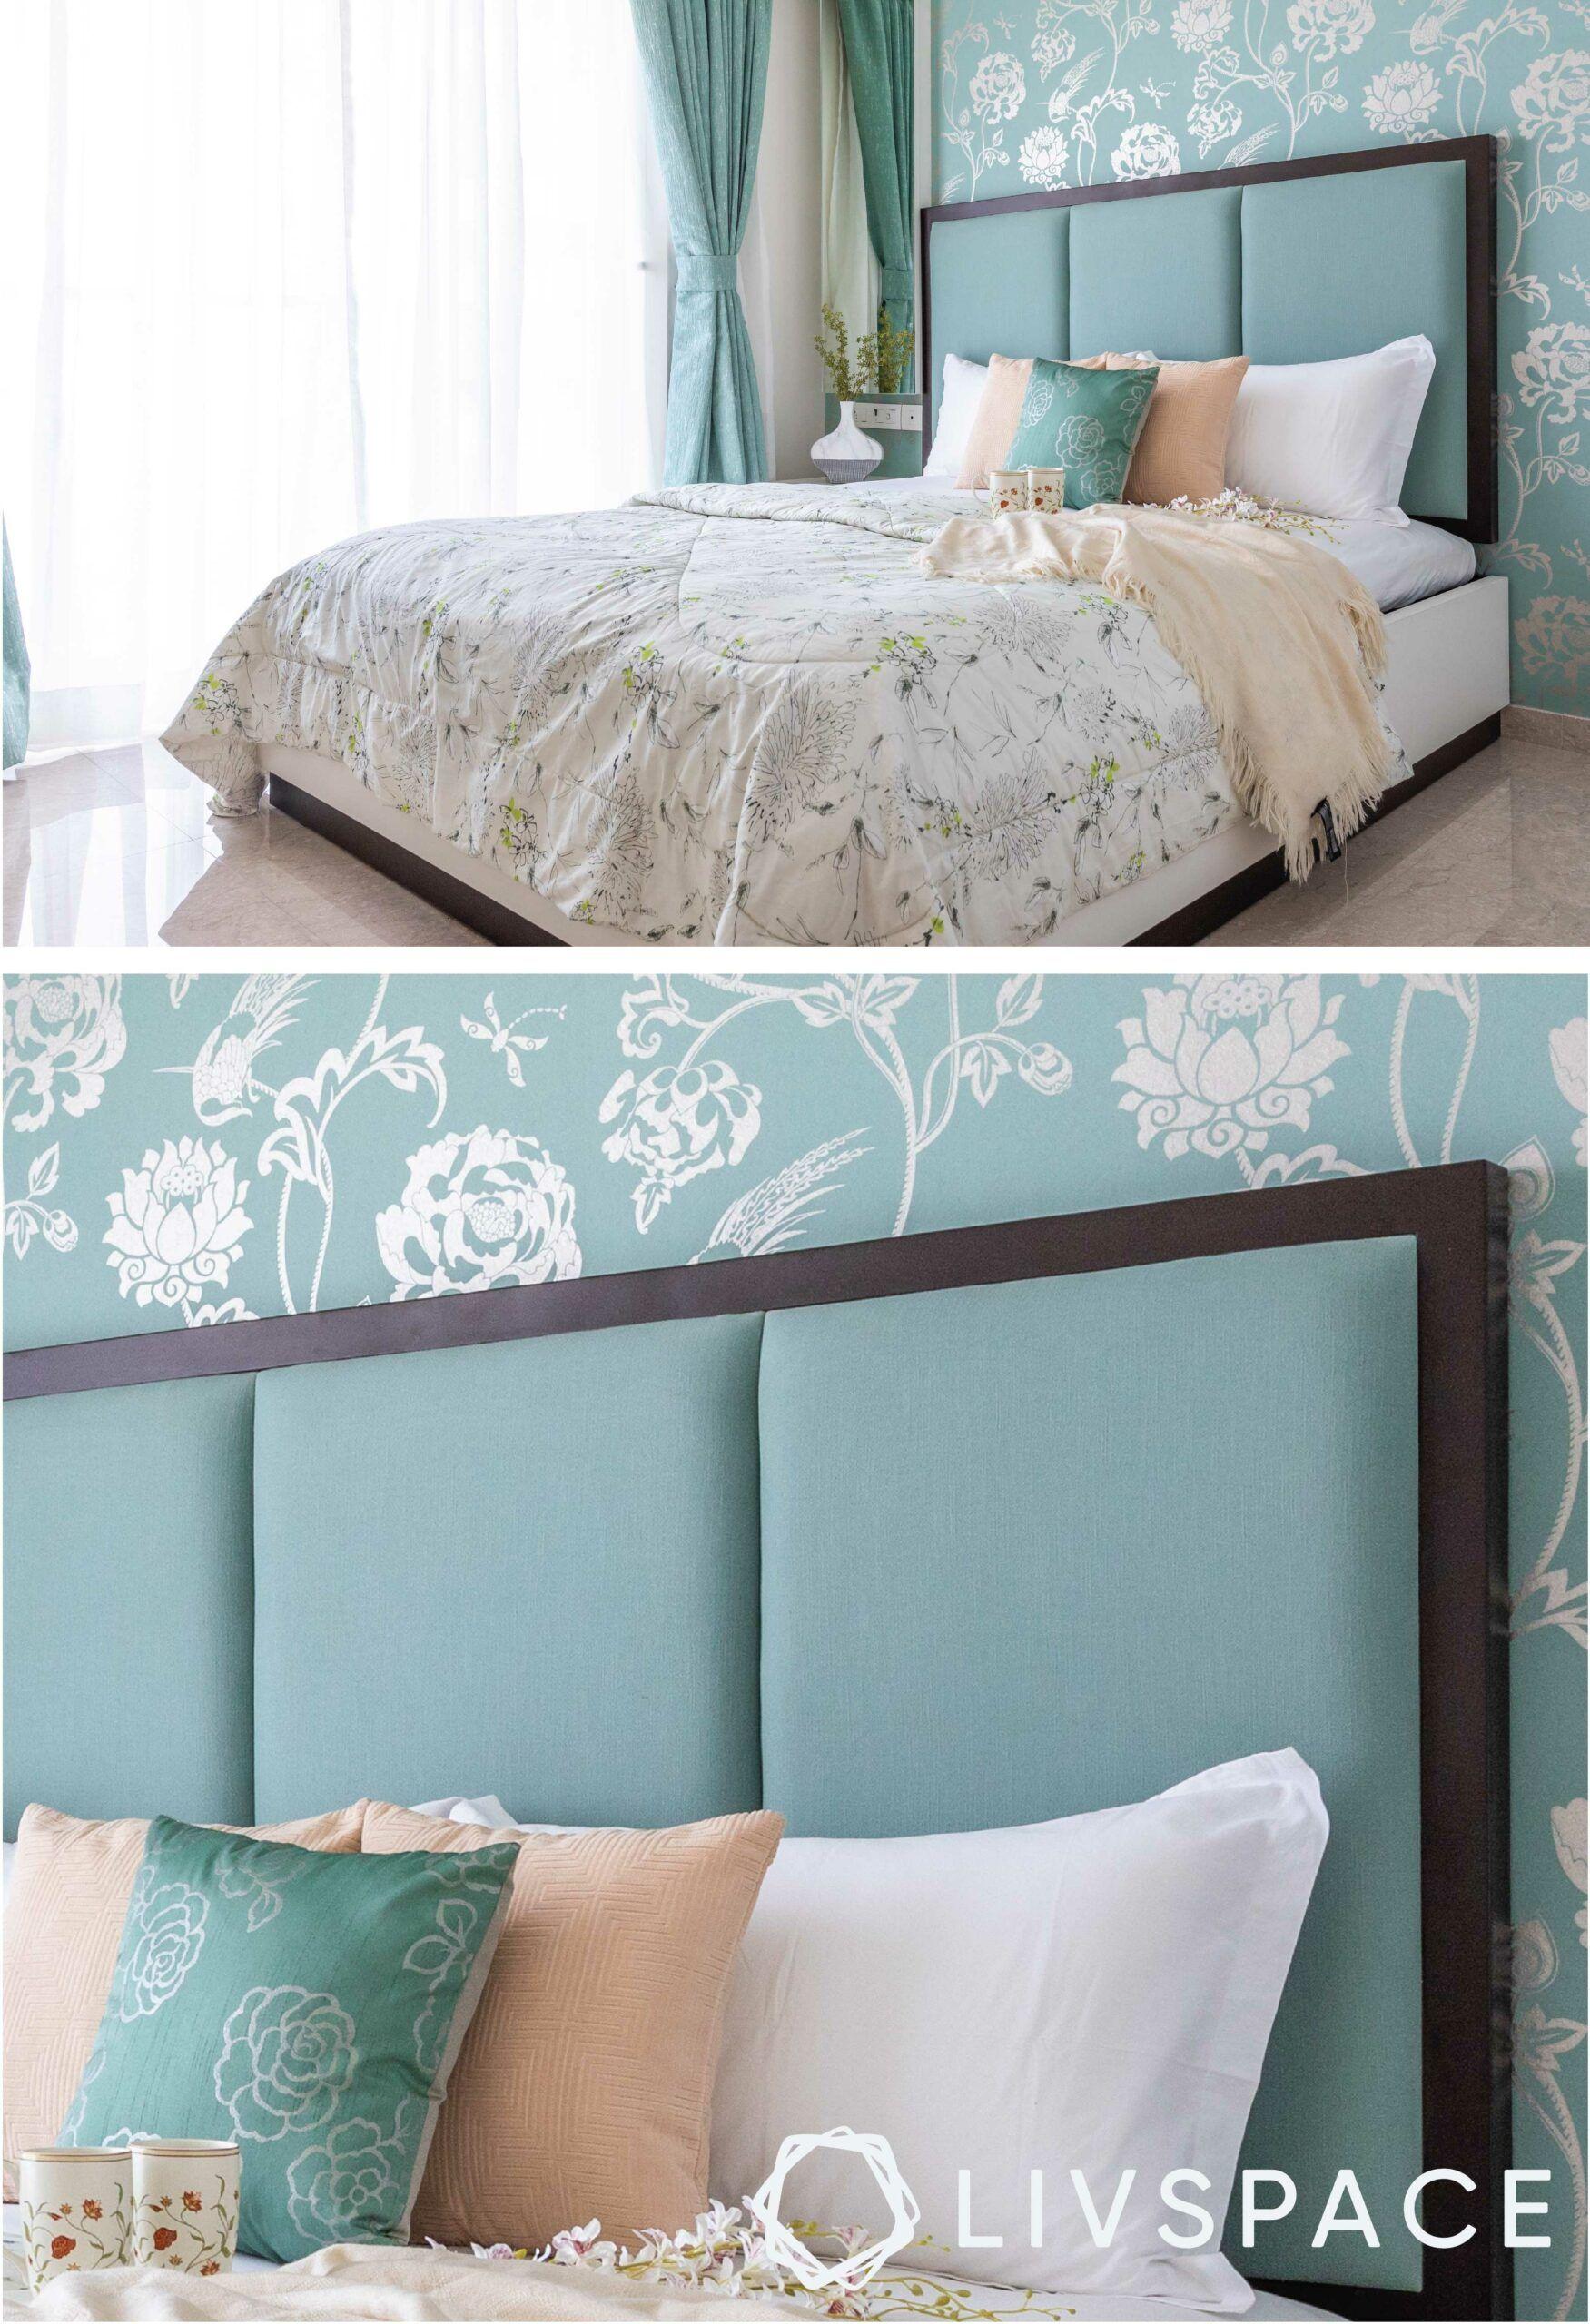 bedroom-design-pastel-wallpaper-minty-green-headboard